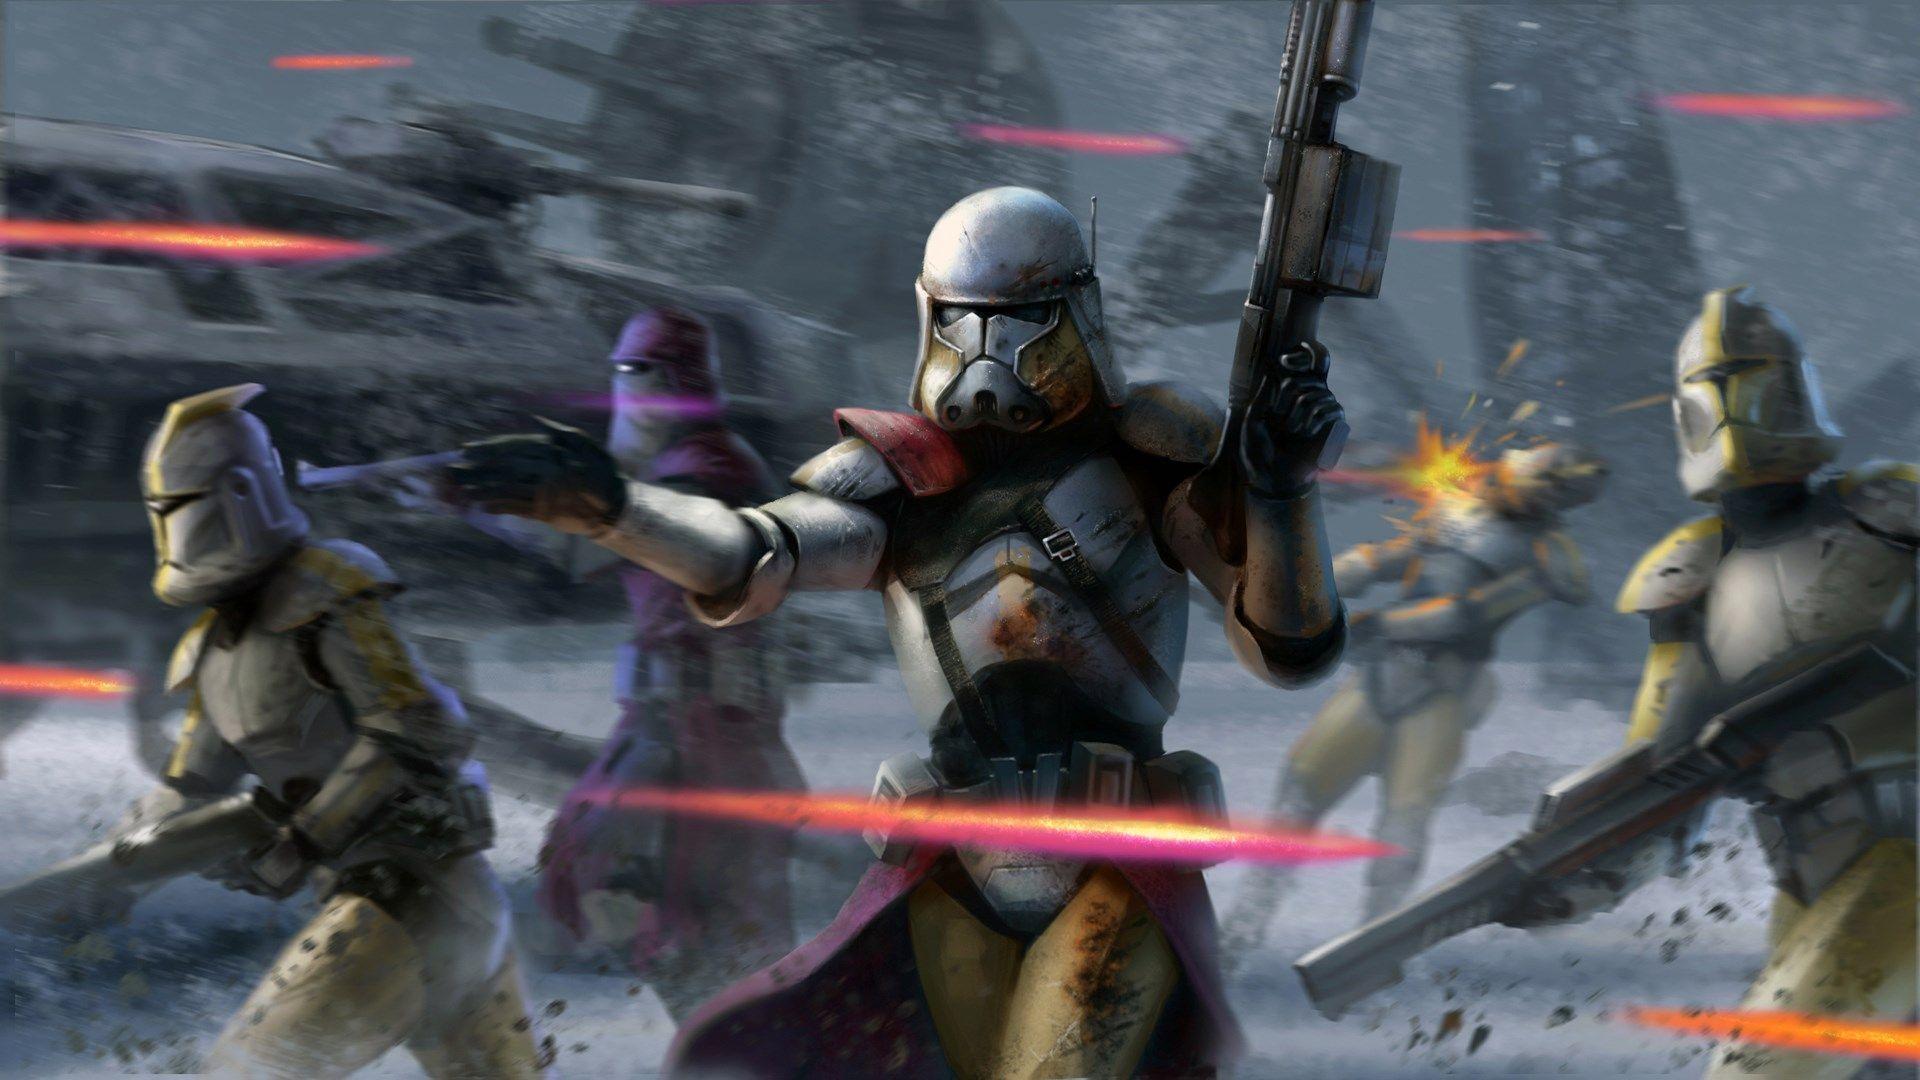 Star Wars Clone Wars Wallpapers Top Free Star Wars Clone Wars Backgrounds Wallpaperaccess